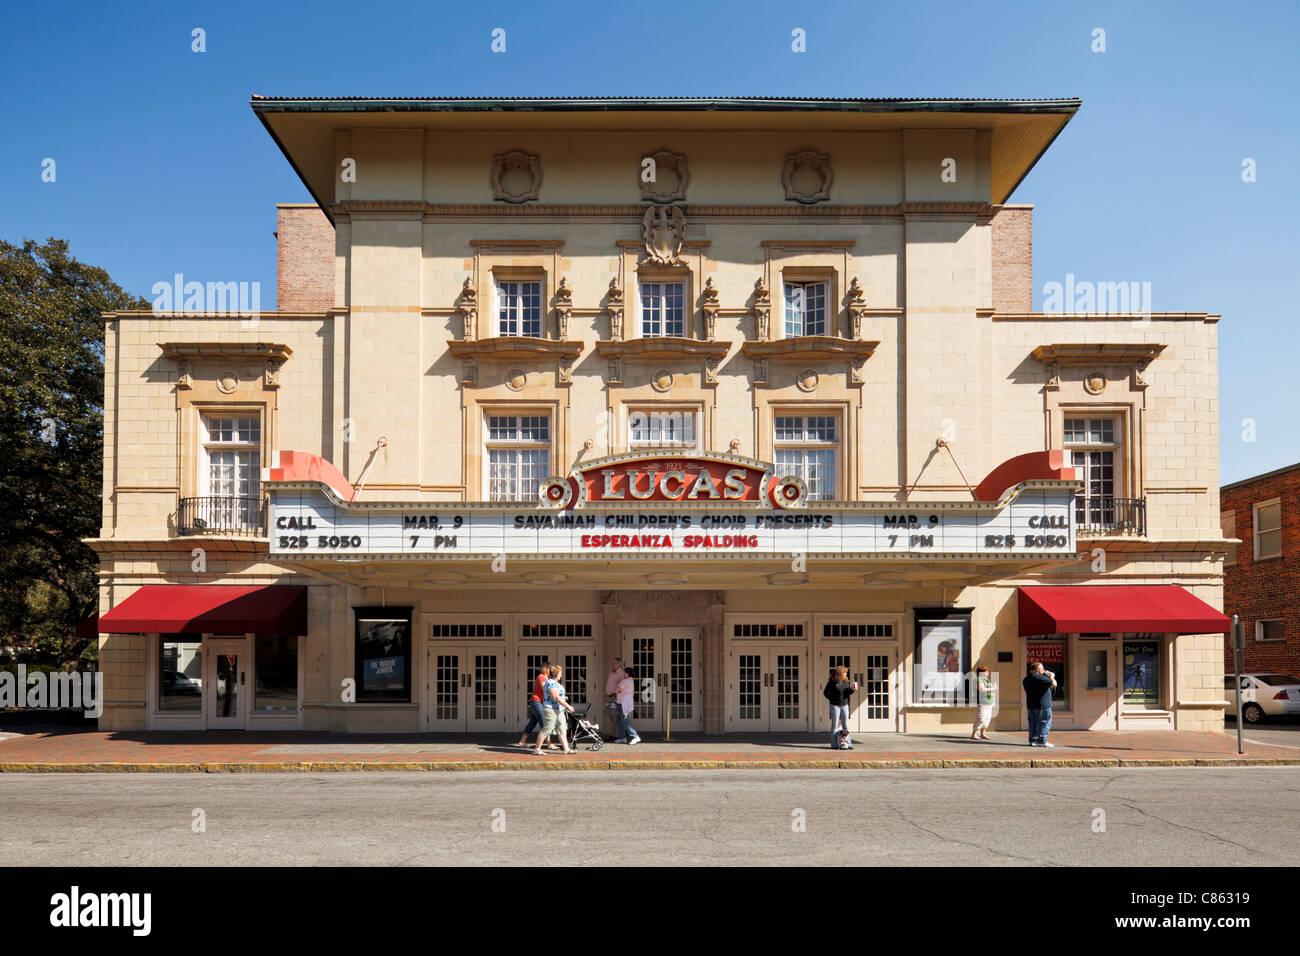 Lucas Theatre, Savannah - Stock Image